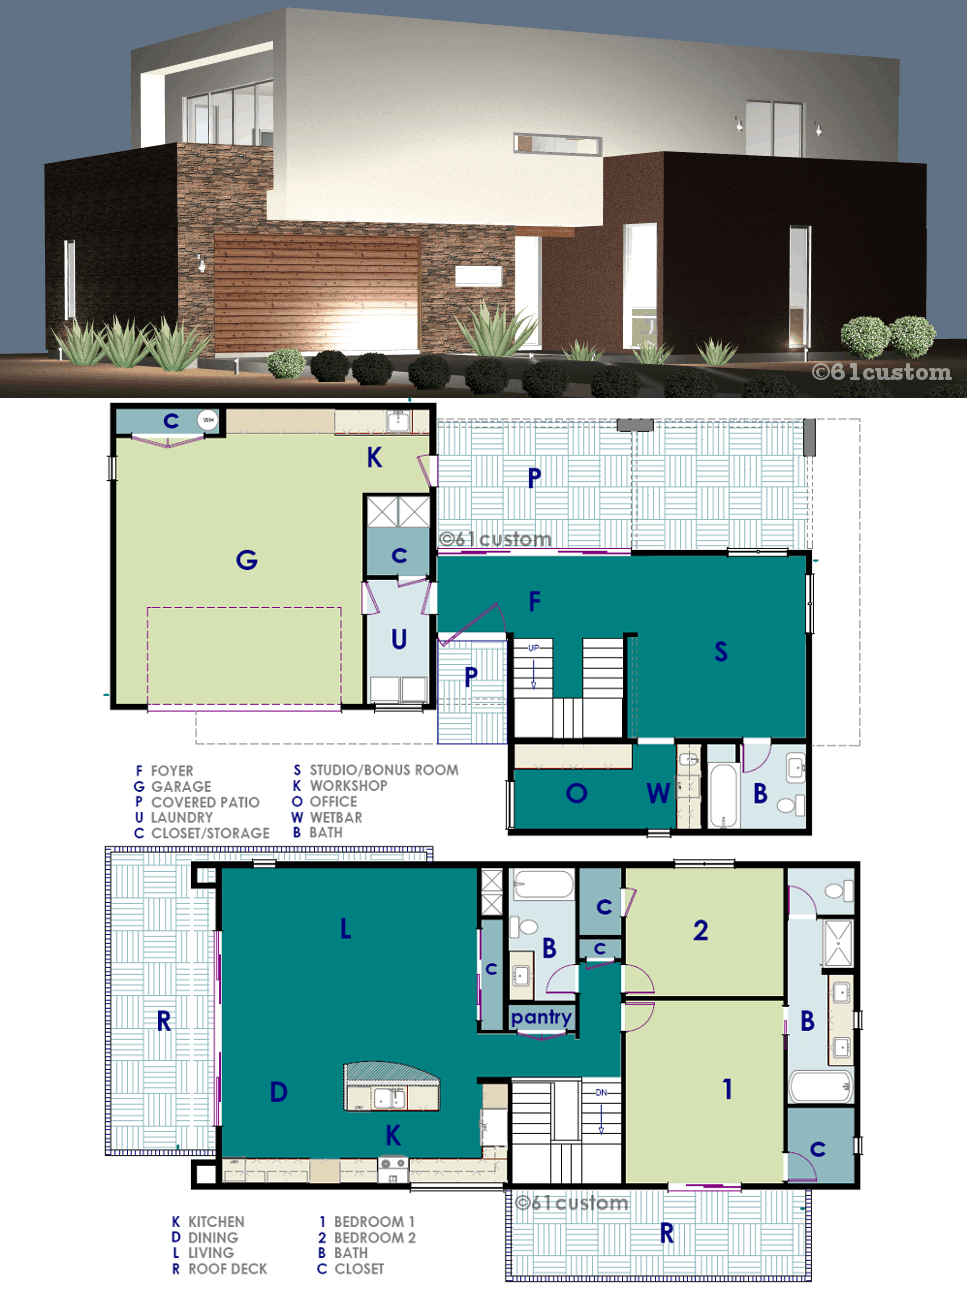 2073sqft Ultra Modern House Plan Allows Clients To Enter